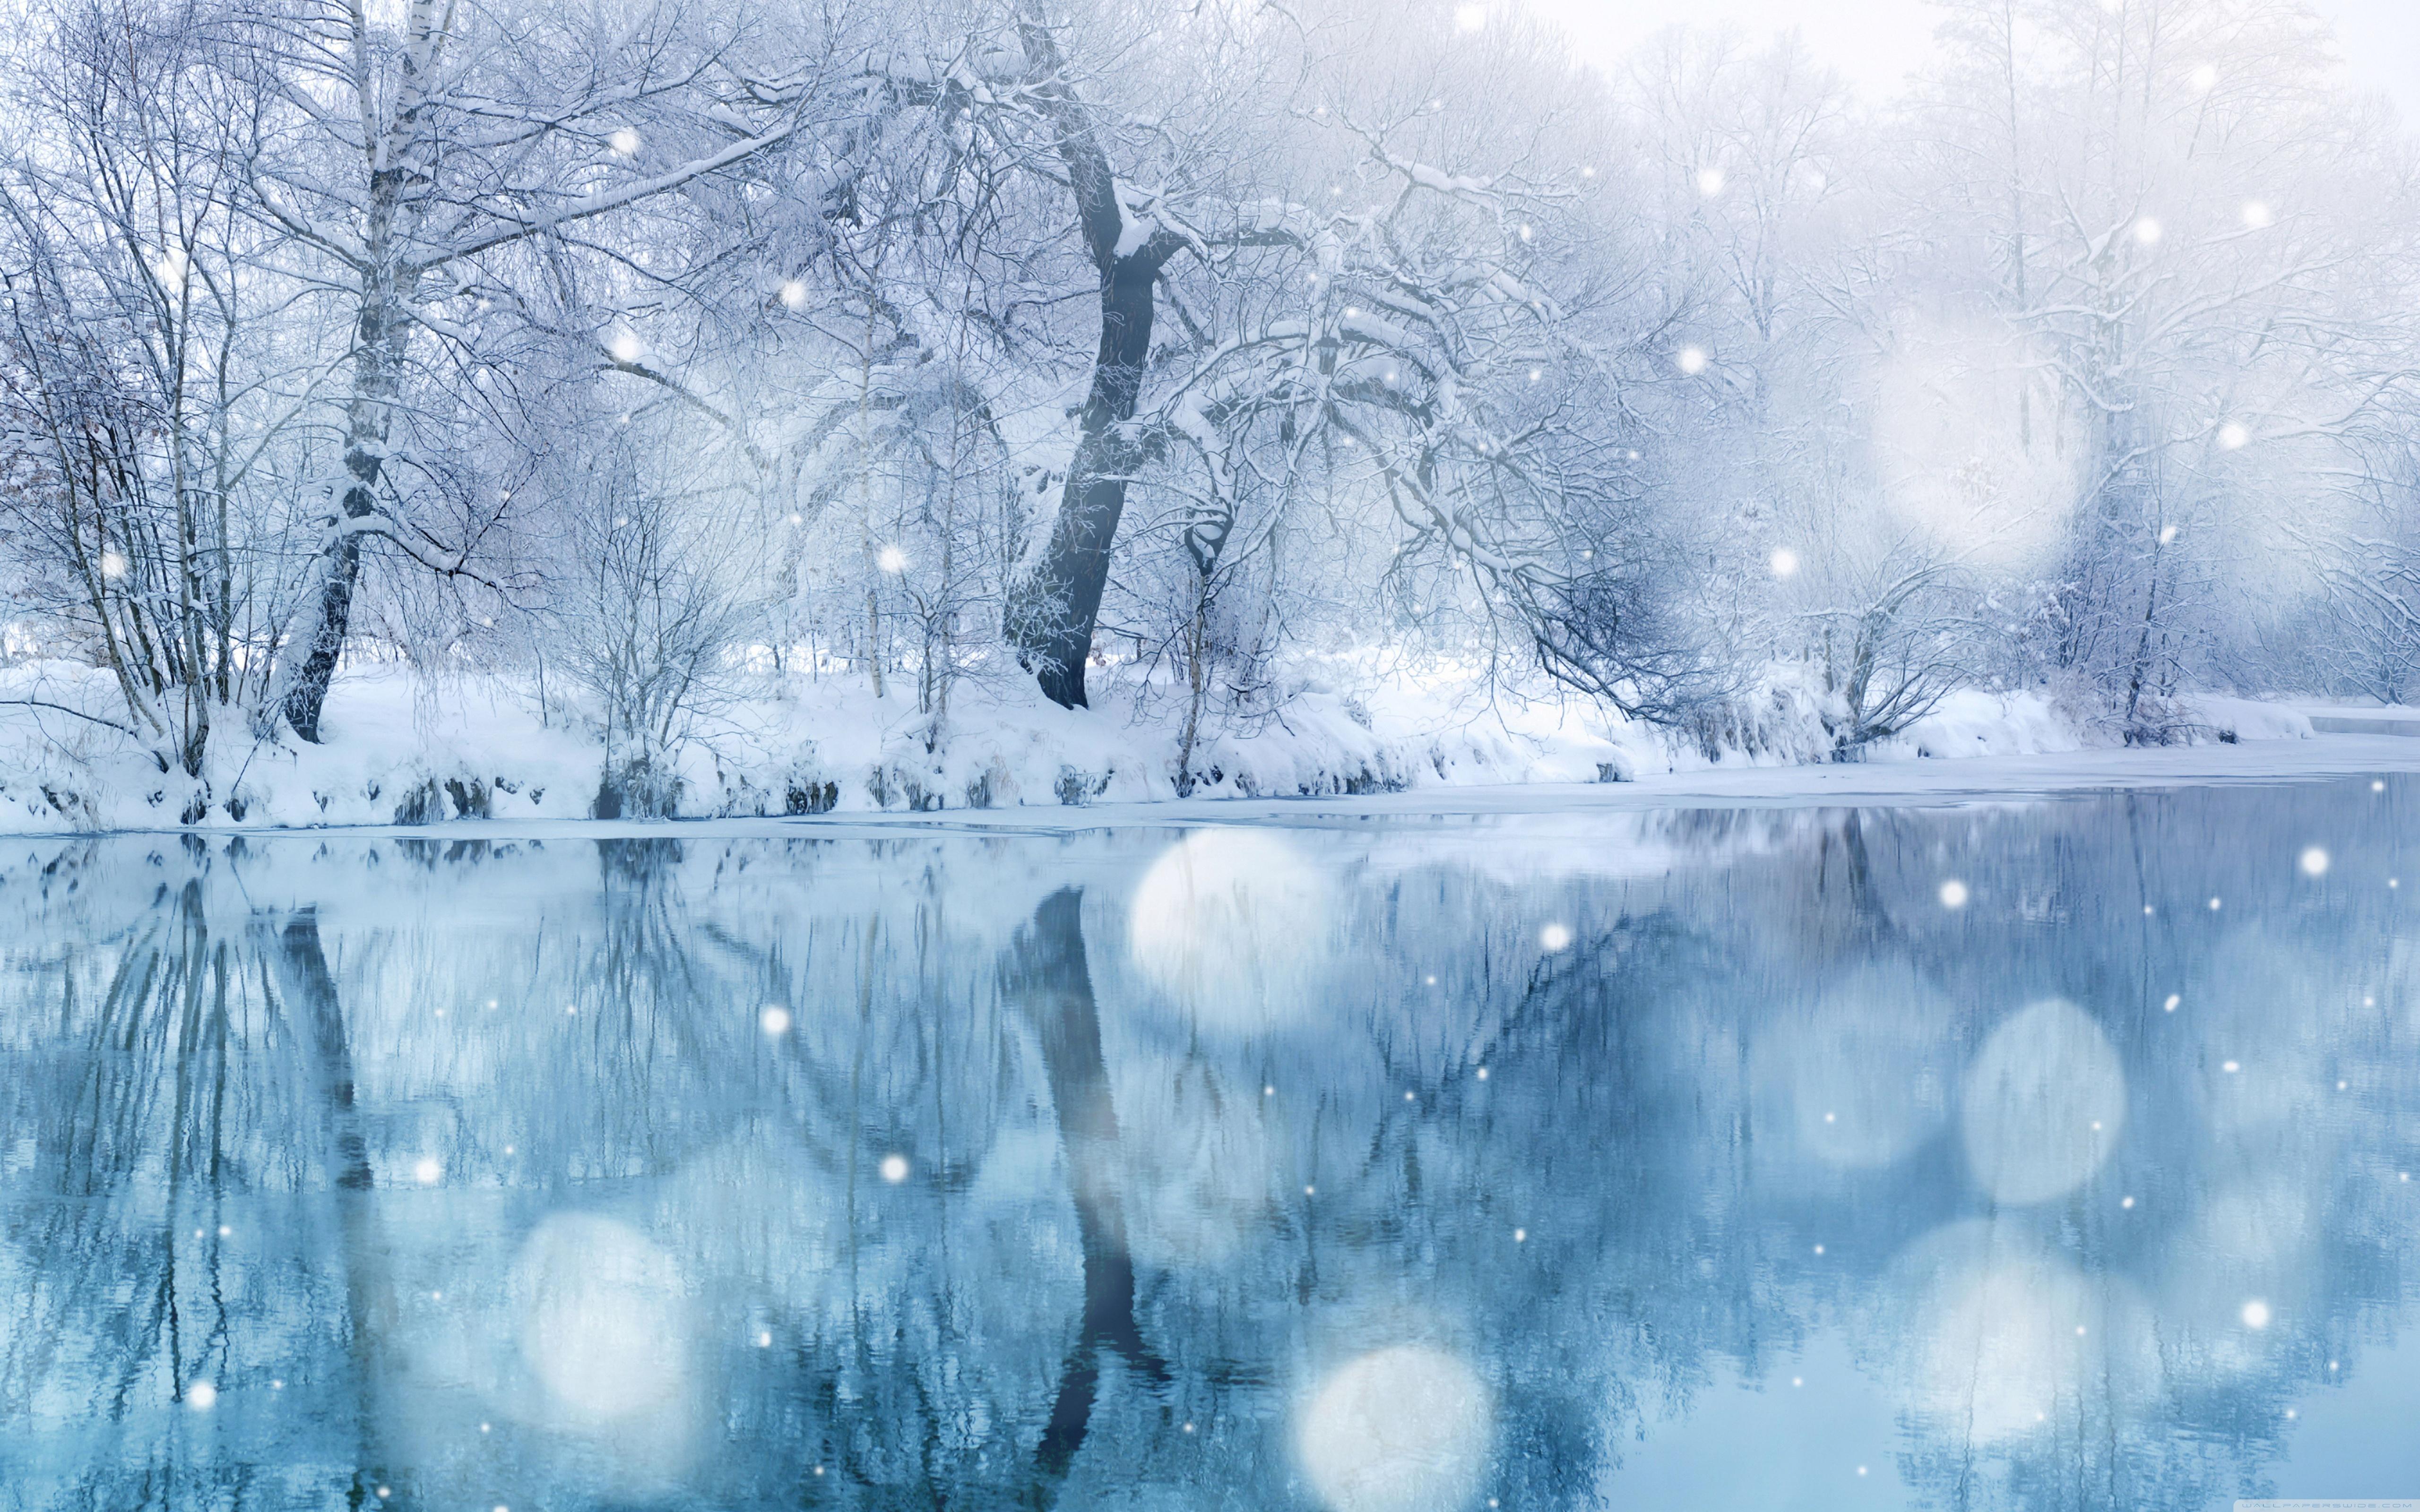 Winter Snowfall 4K HD Desktop Wallpaper for 4K Ultra HD TV 5120x3200